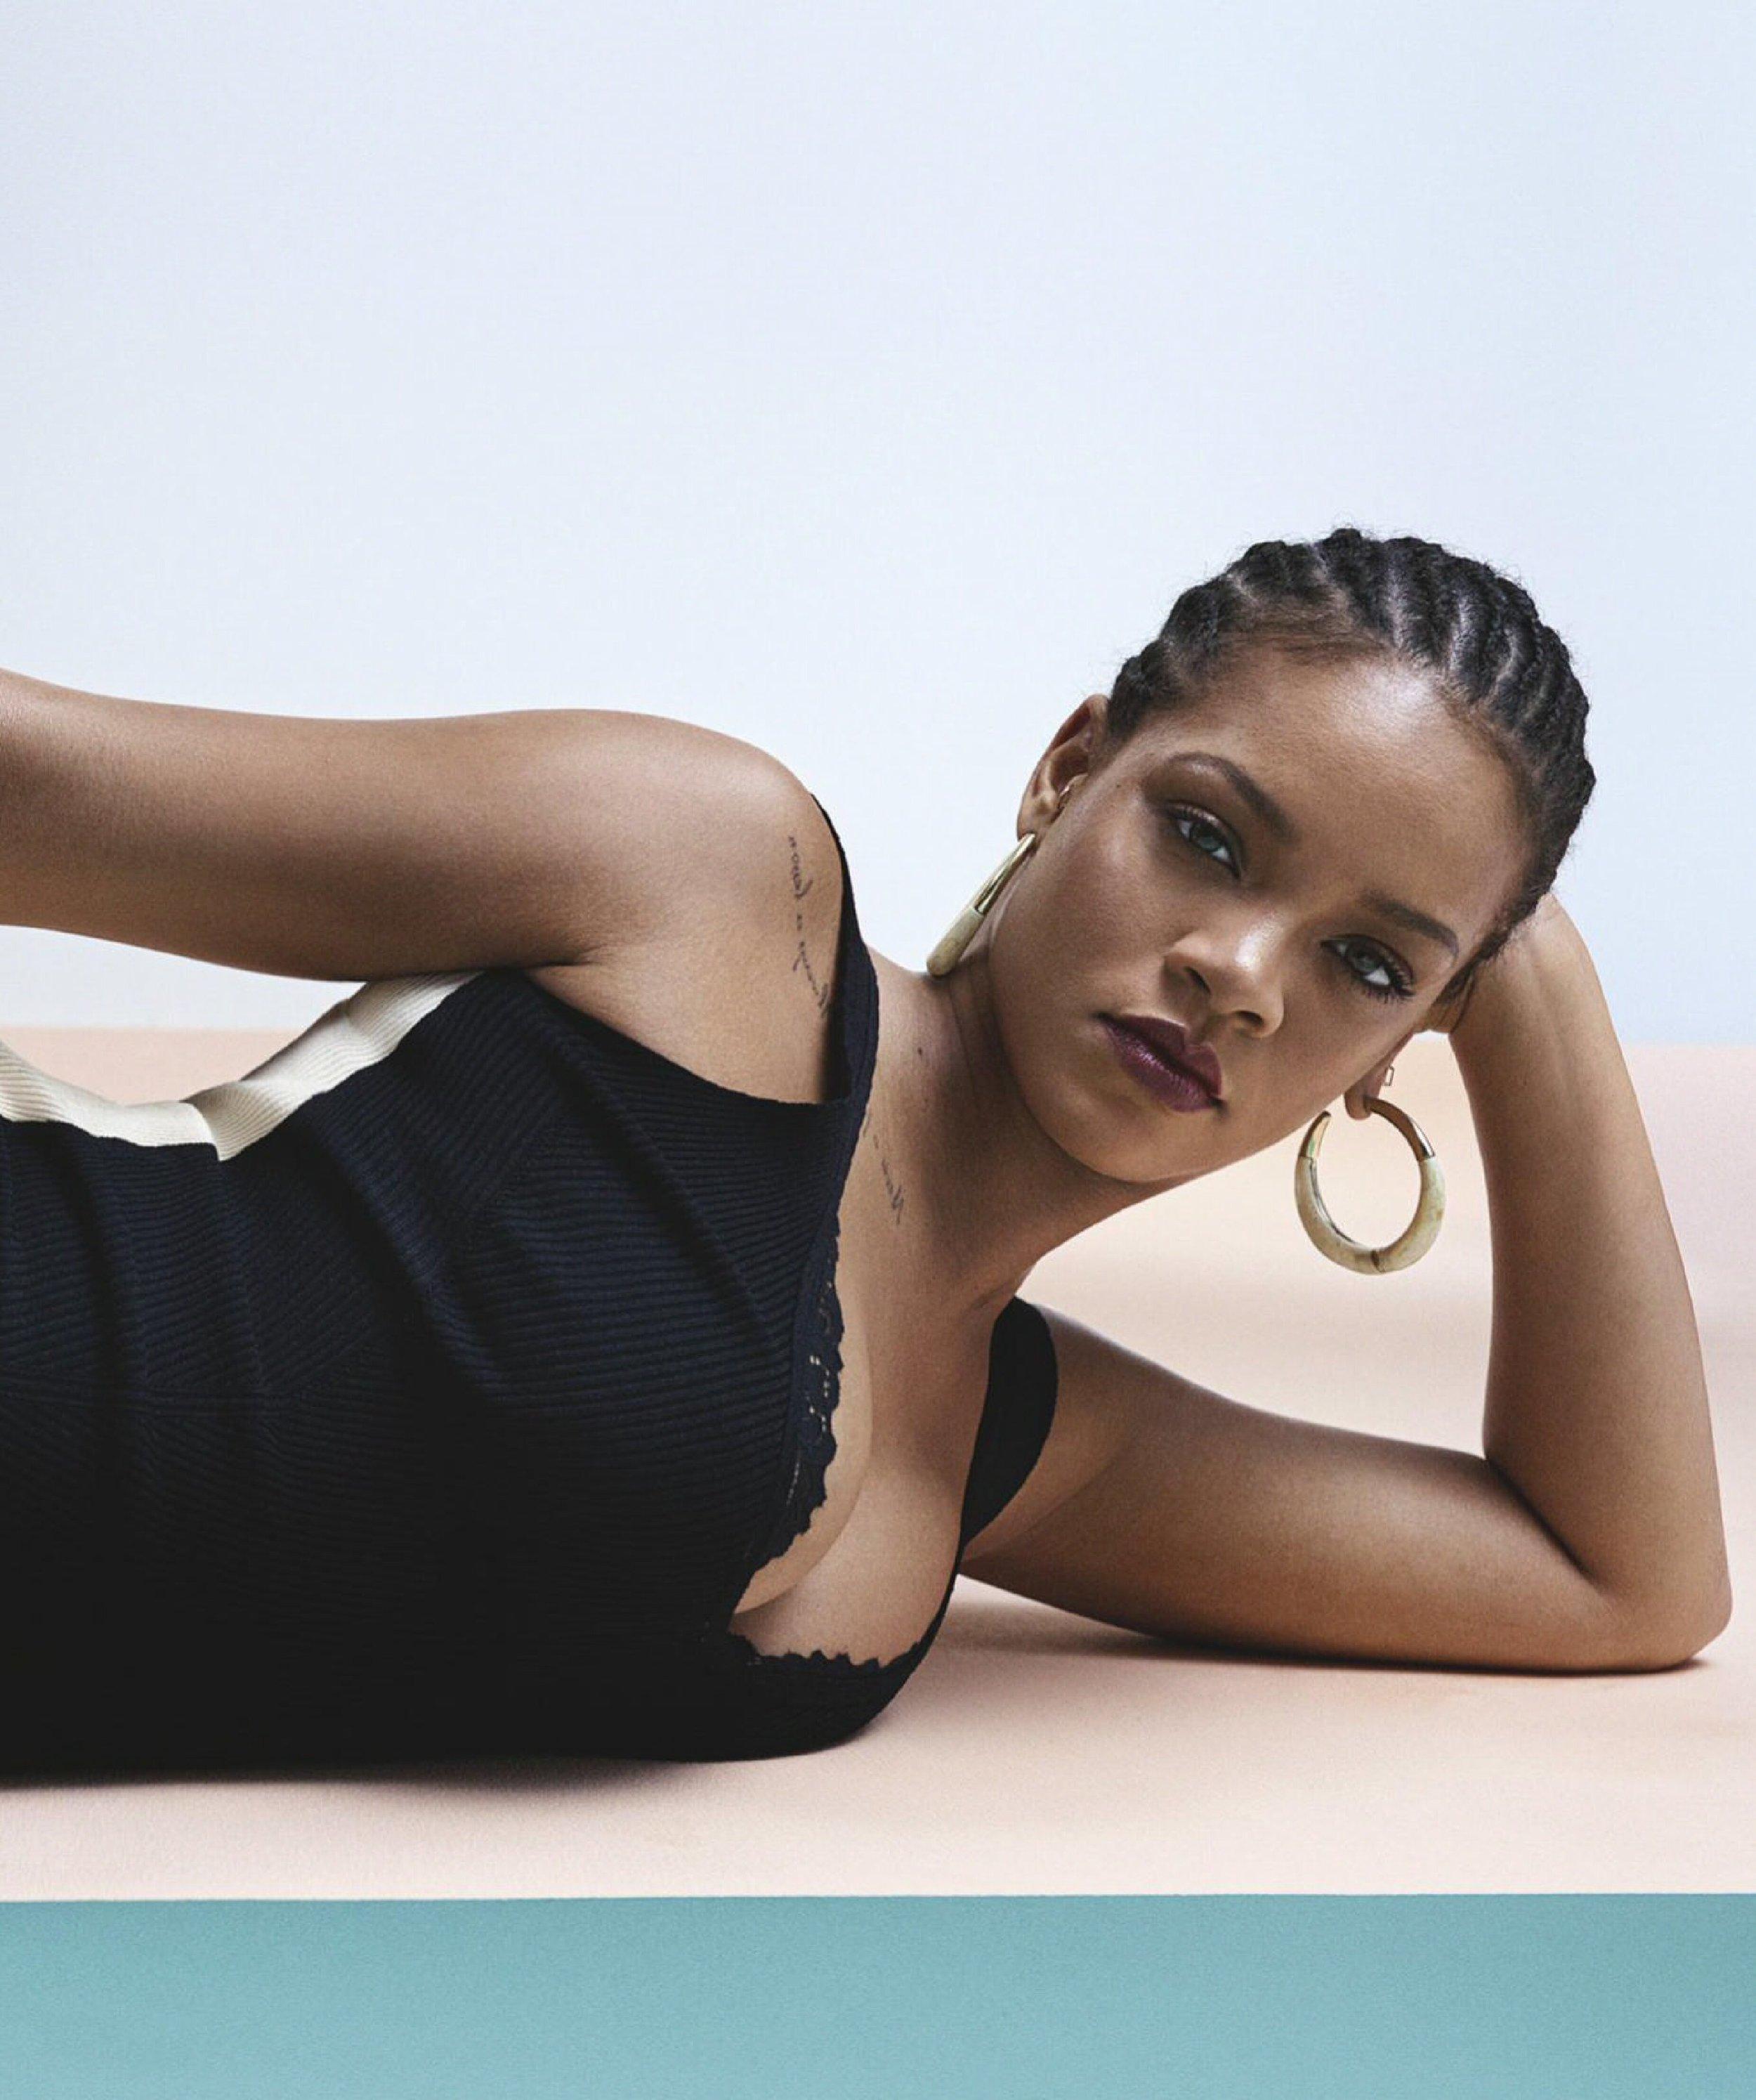 Rihanna-Josh-Olins-Vogue-Australia-May-2019- (10).jpg